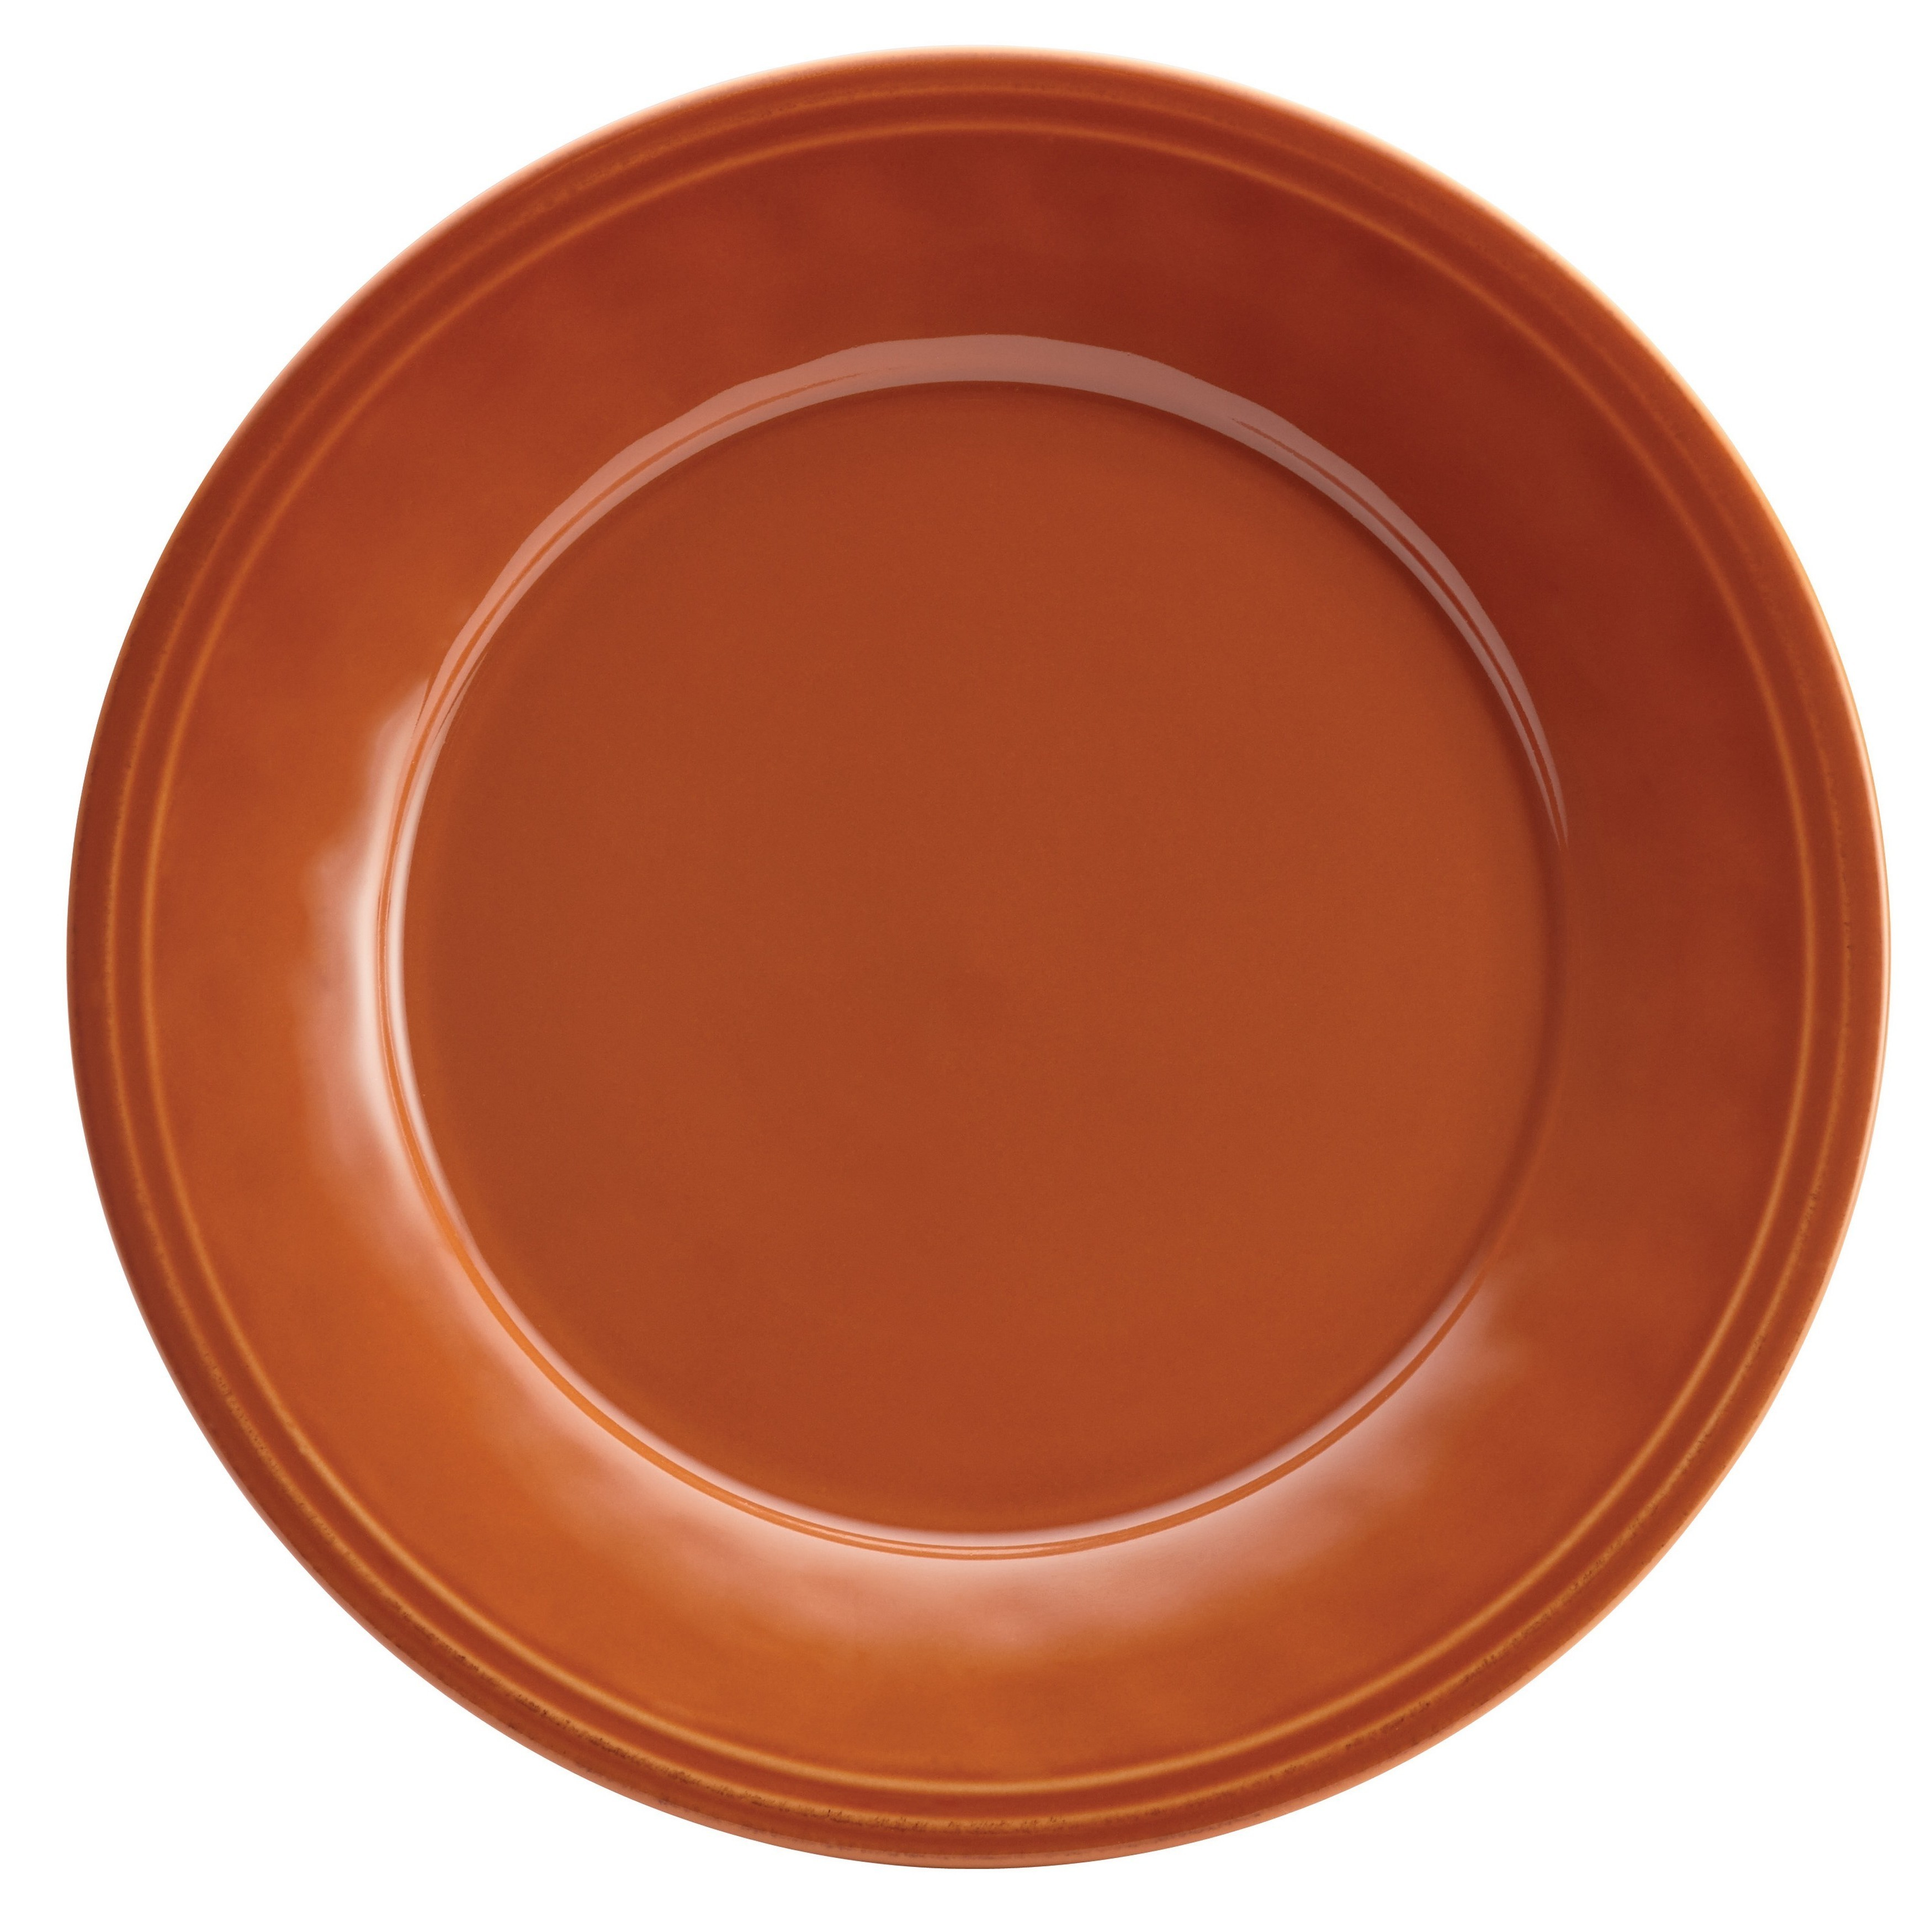 Rachael Ray Cucina Dinnerware 16-piece Stoneware Dinnerware Set - Free Shipping Today - Overstock - 16378516  sc 1 st  Overstock & Rachael Ray Cucina Dinnerware 16-piece Stoneware Dinnerware Set ...